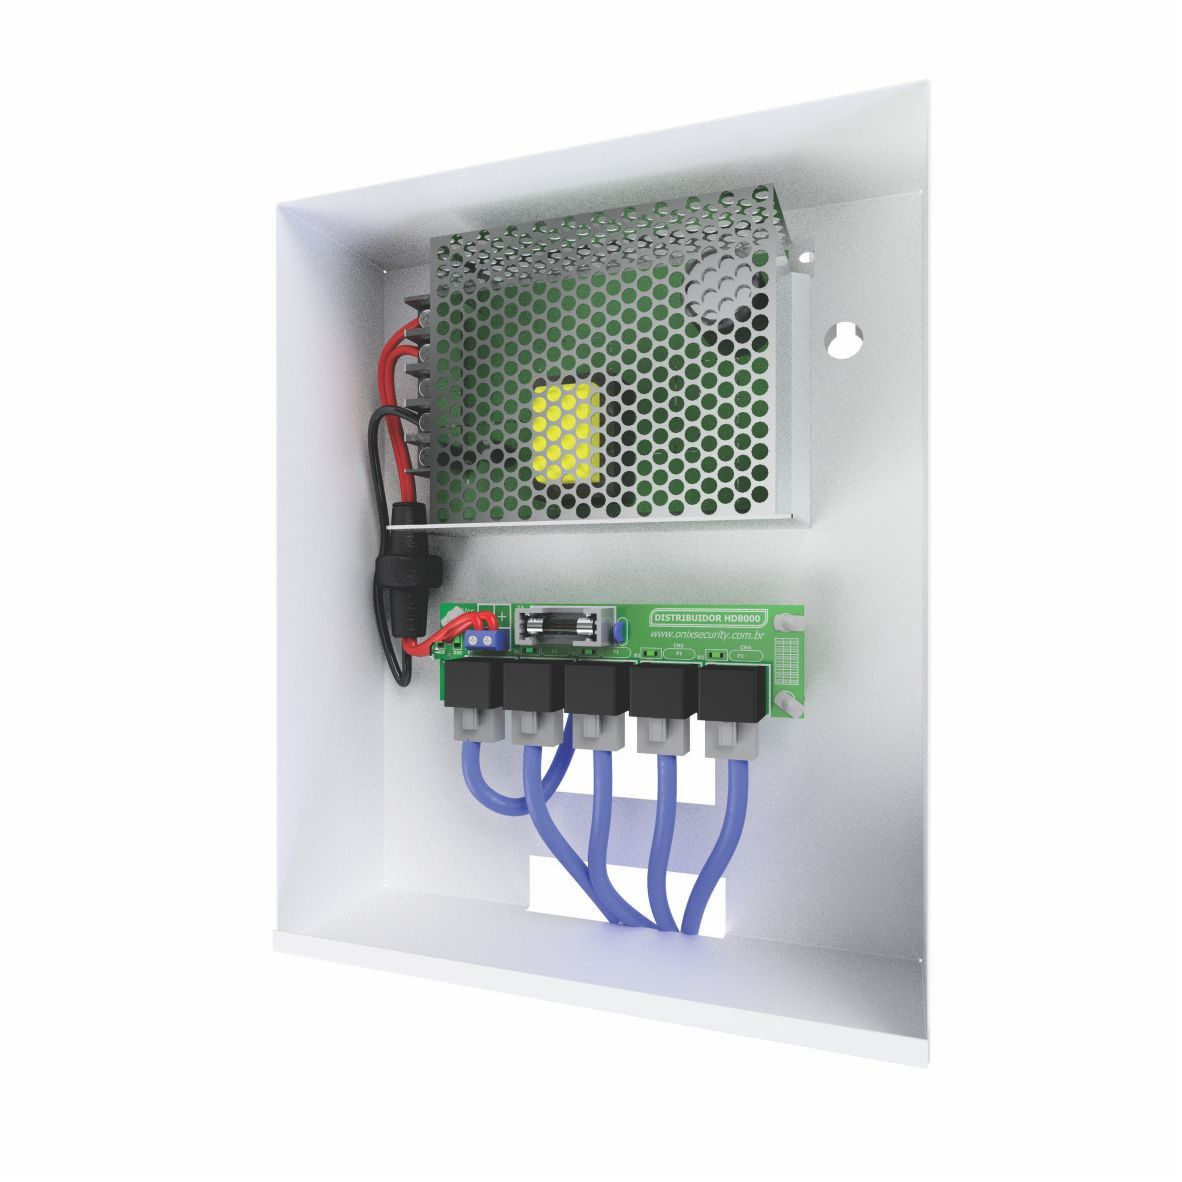 Rack Power Balun Pvt 4 Canais Completo Hd 4000 Vertical Onix